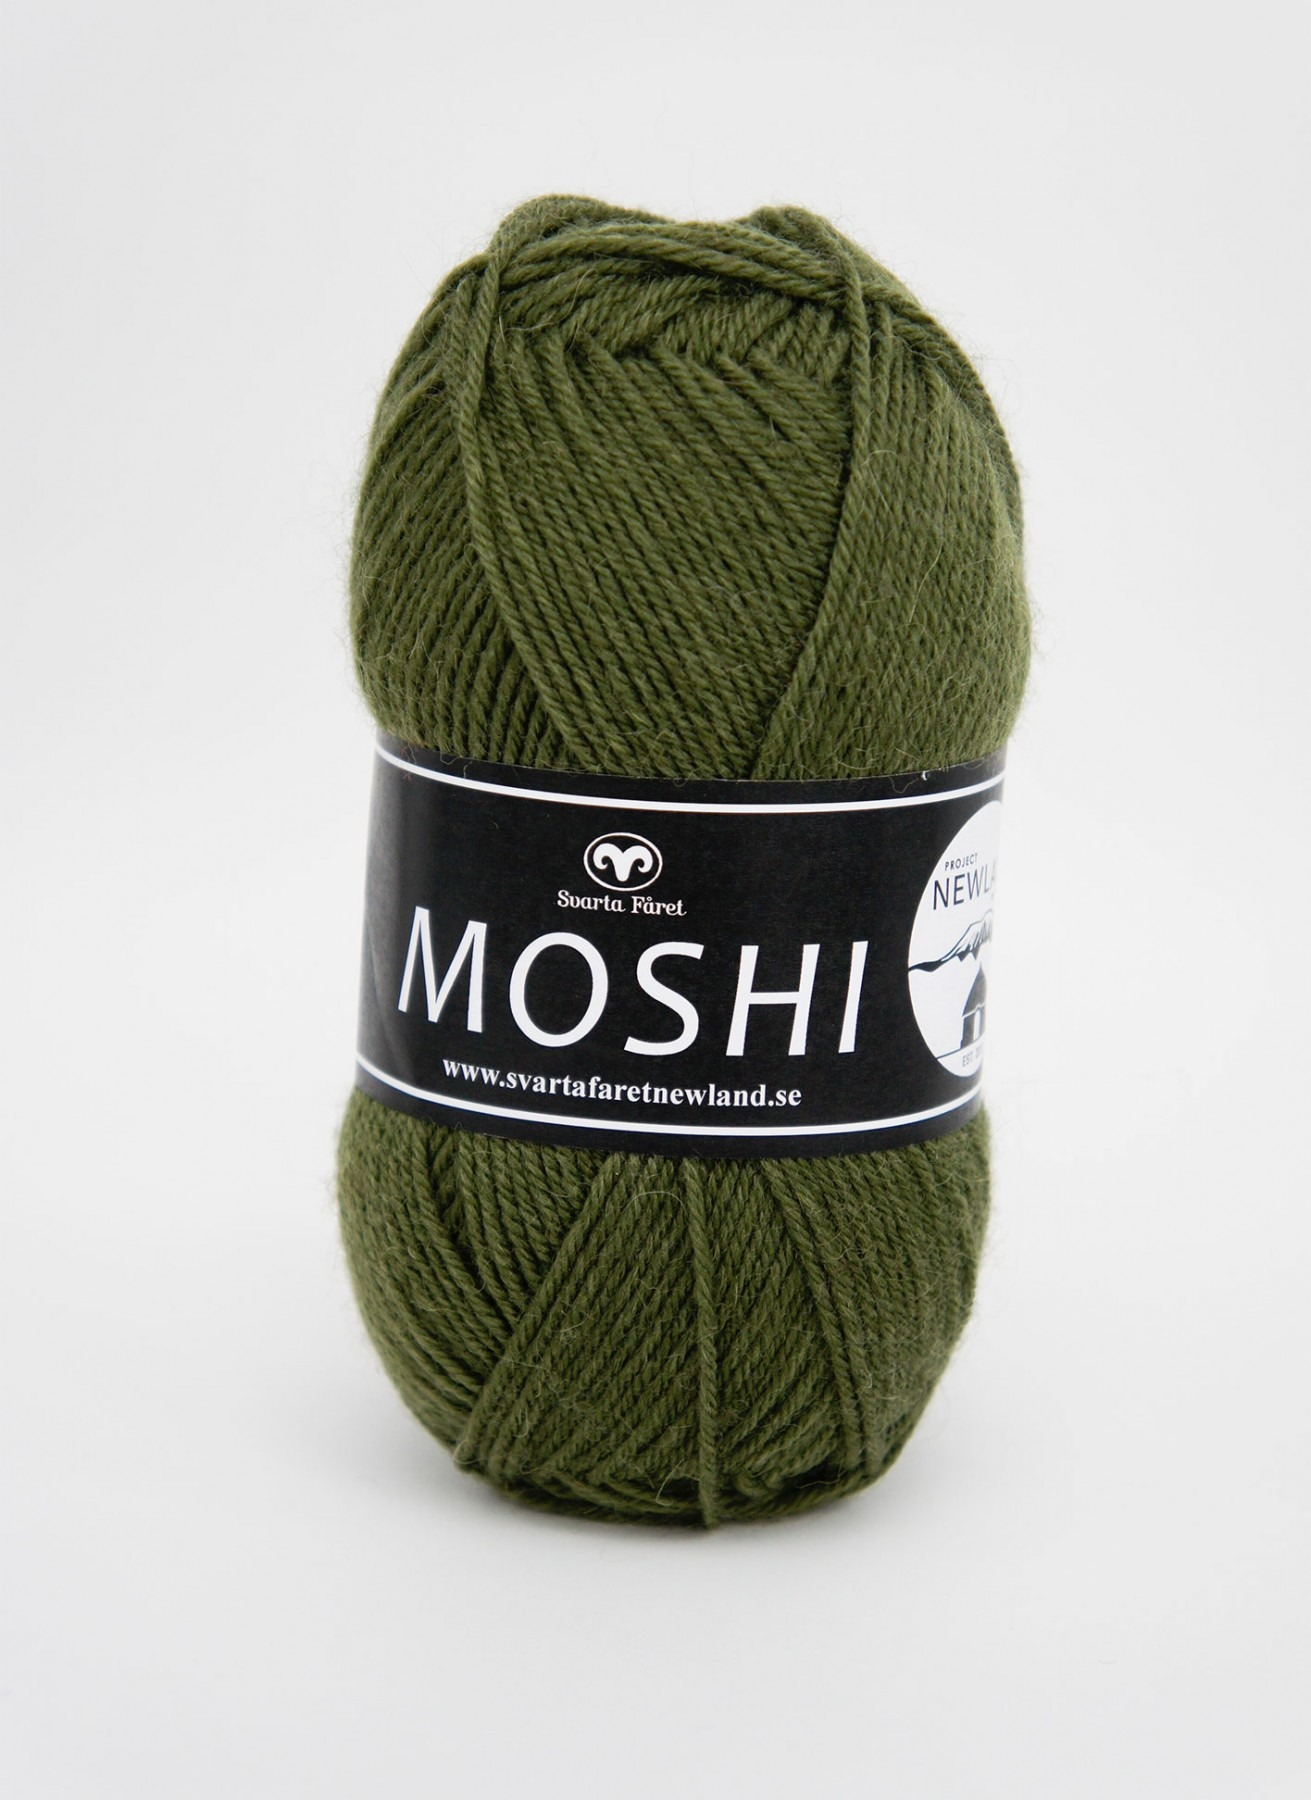 moshi olivgrön 84